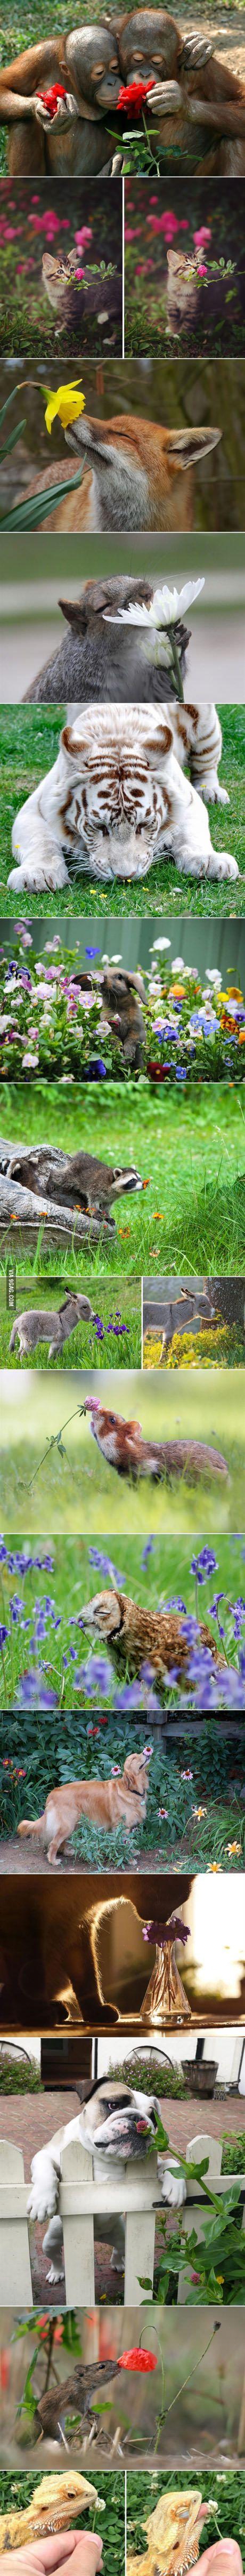 Animaux + fleurs